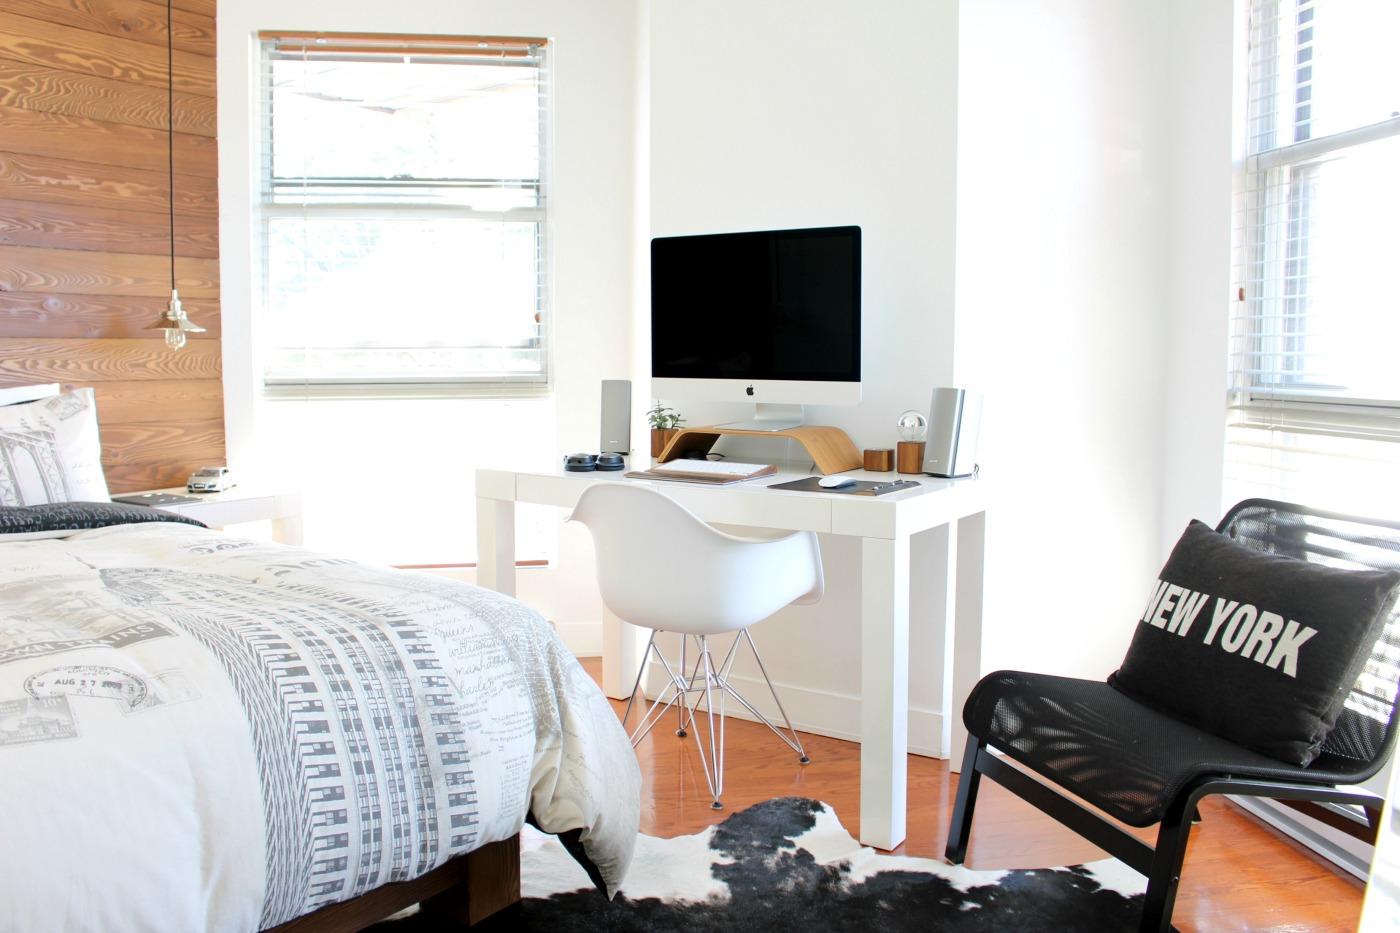 Slaapkamer opknappen - 5 frisse ideeën - Leukegeit